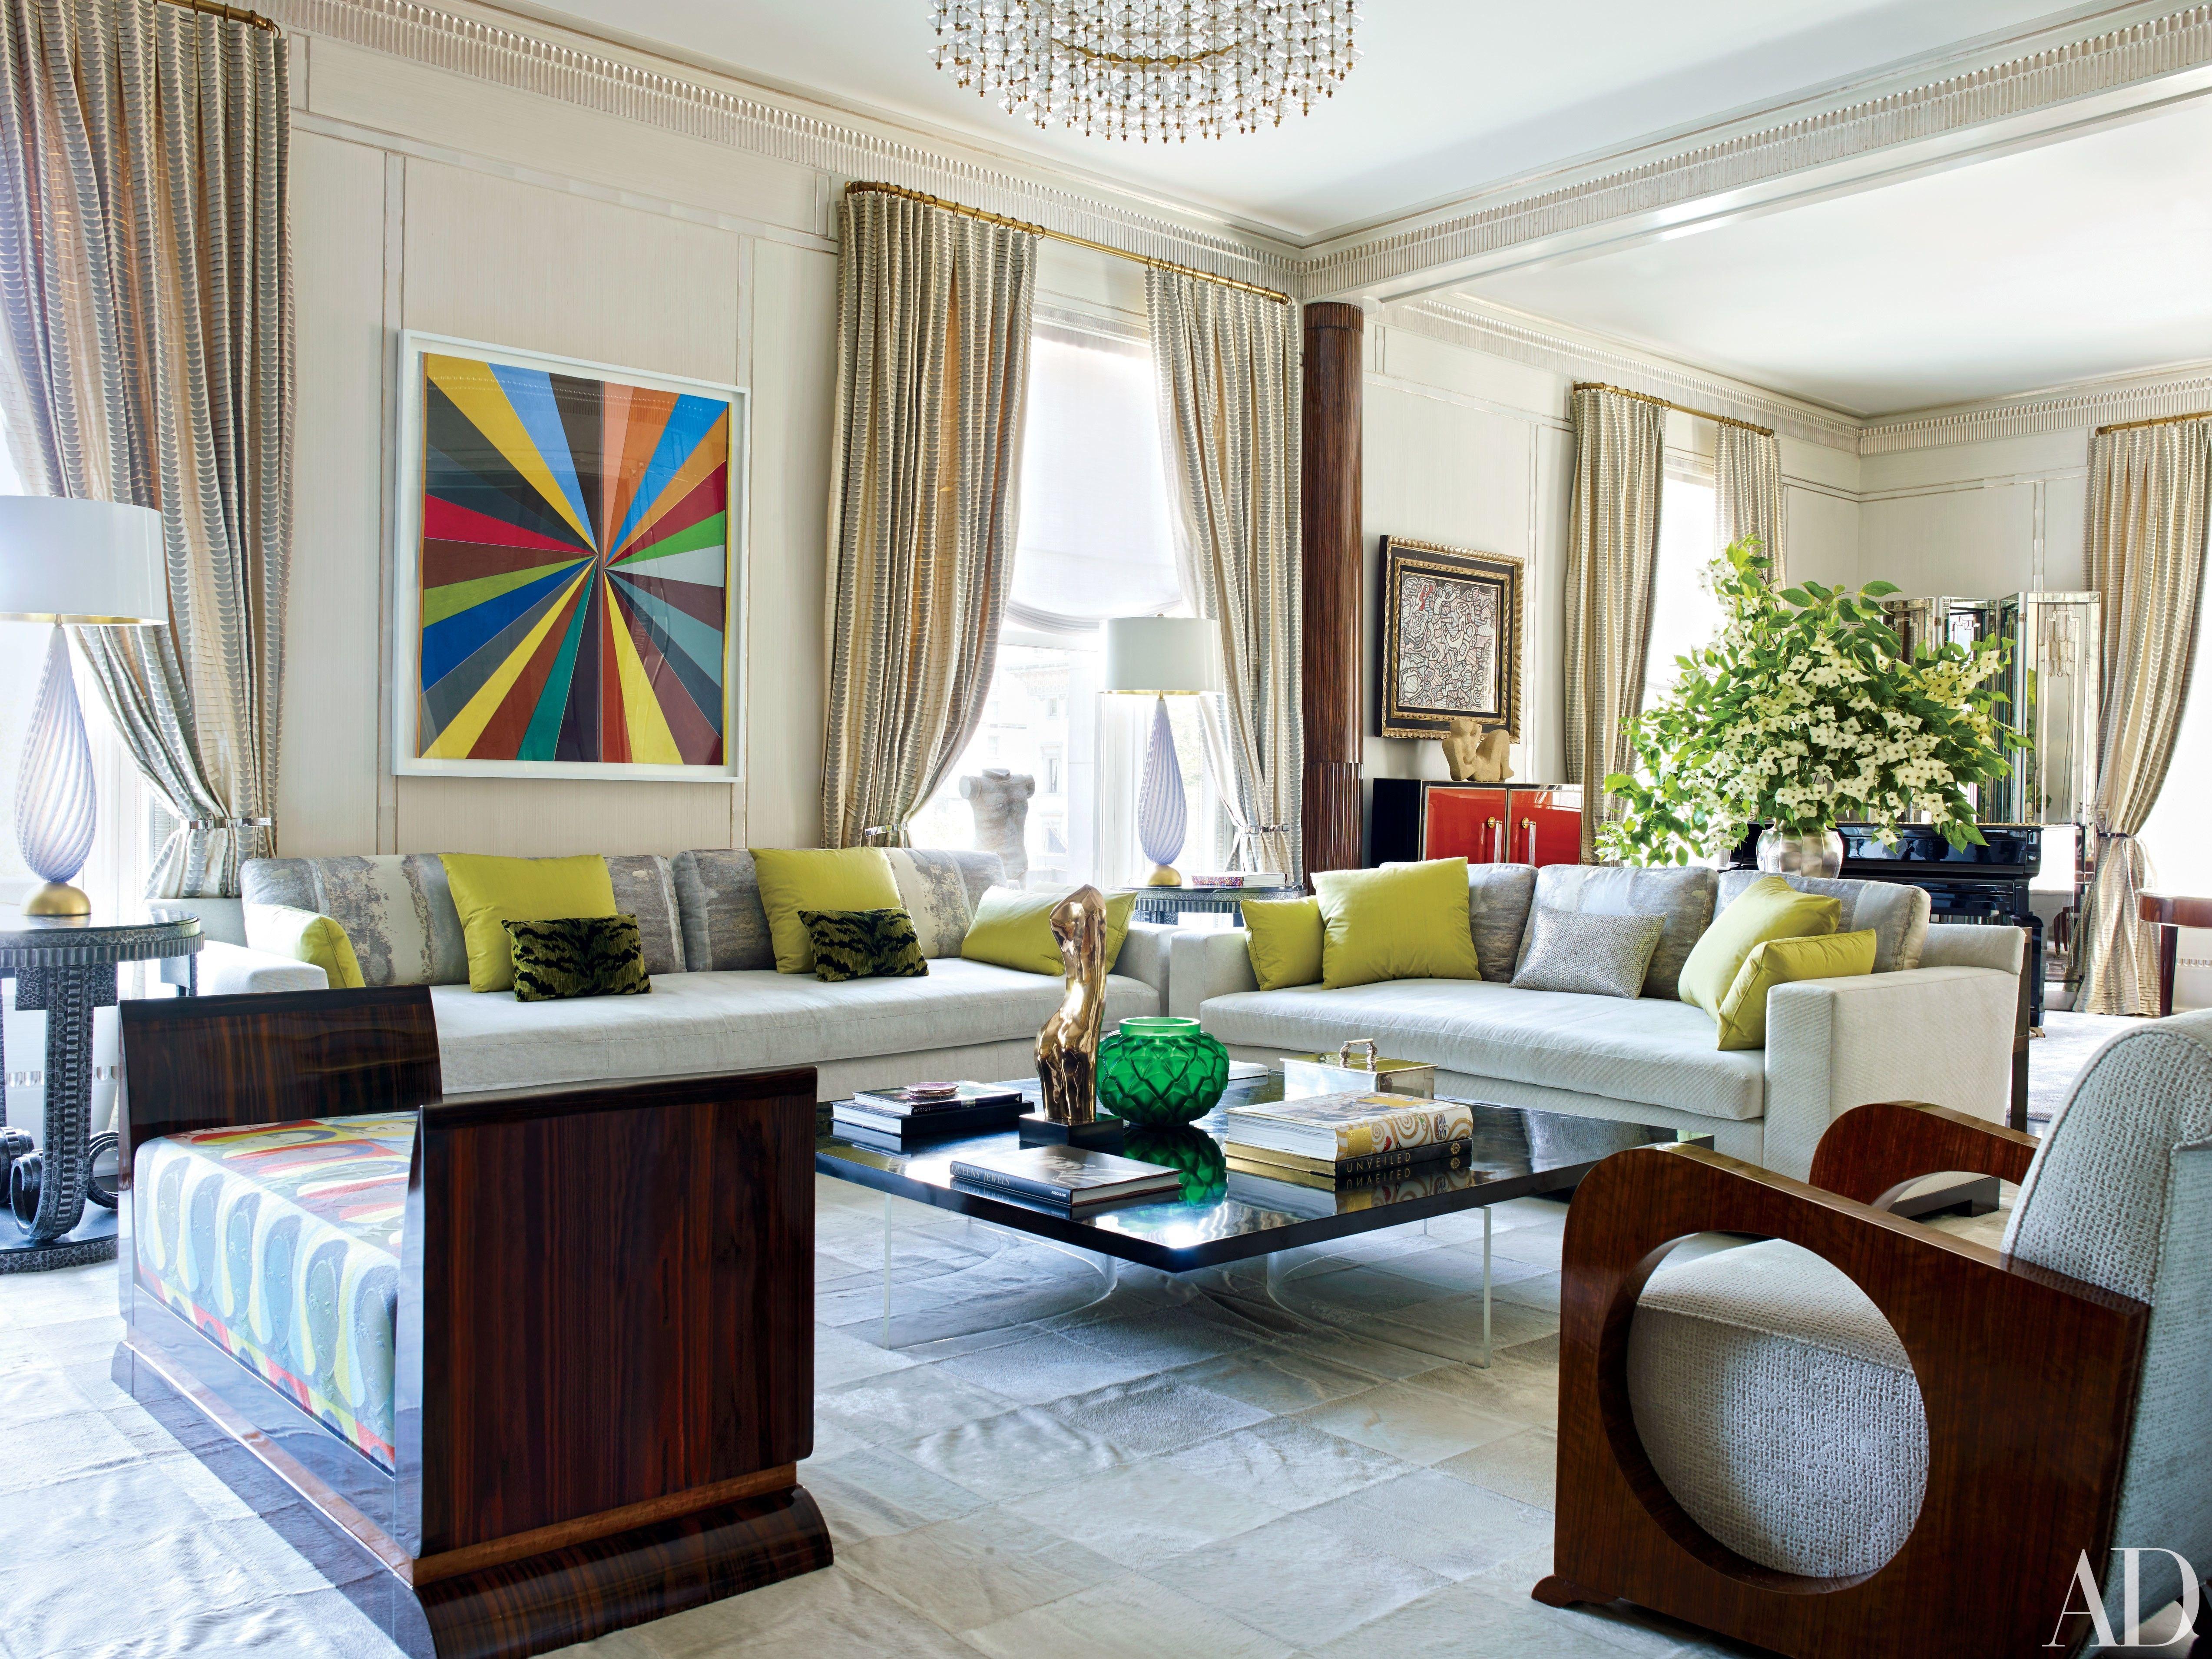 Art Deco Interior Design Furniture Color Schemes Ideas In 2020 Art Deco Interior Design Living Room Art Deco Living Room Interior Deco